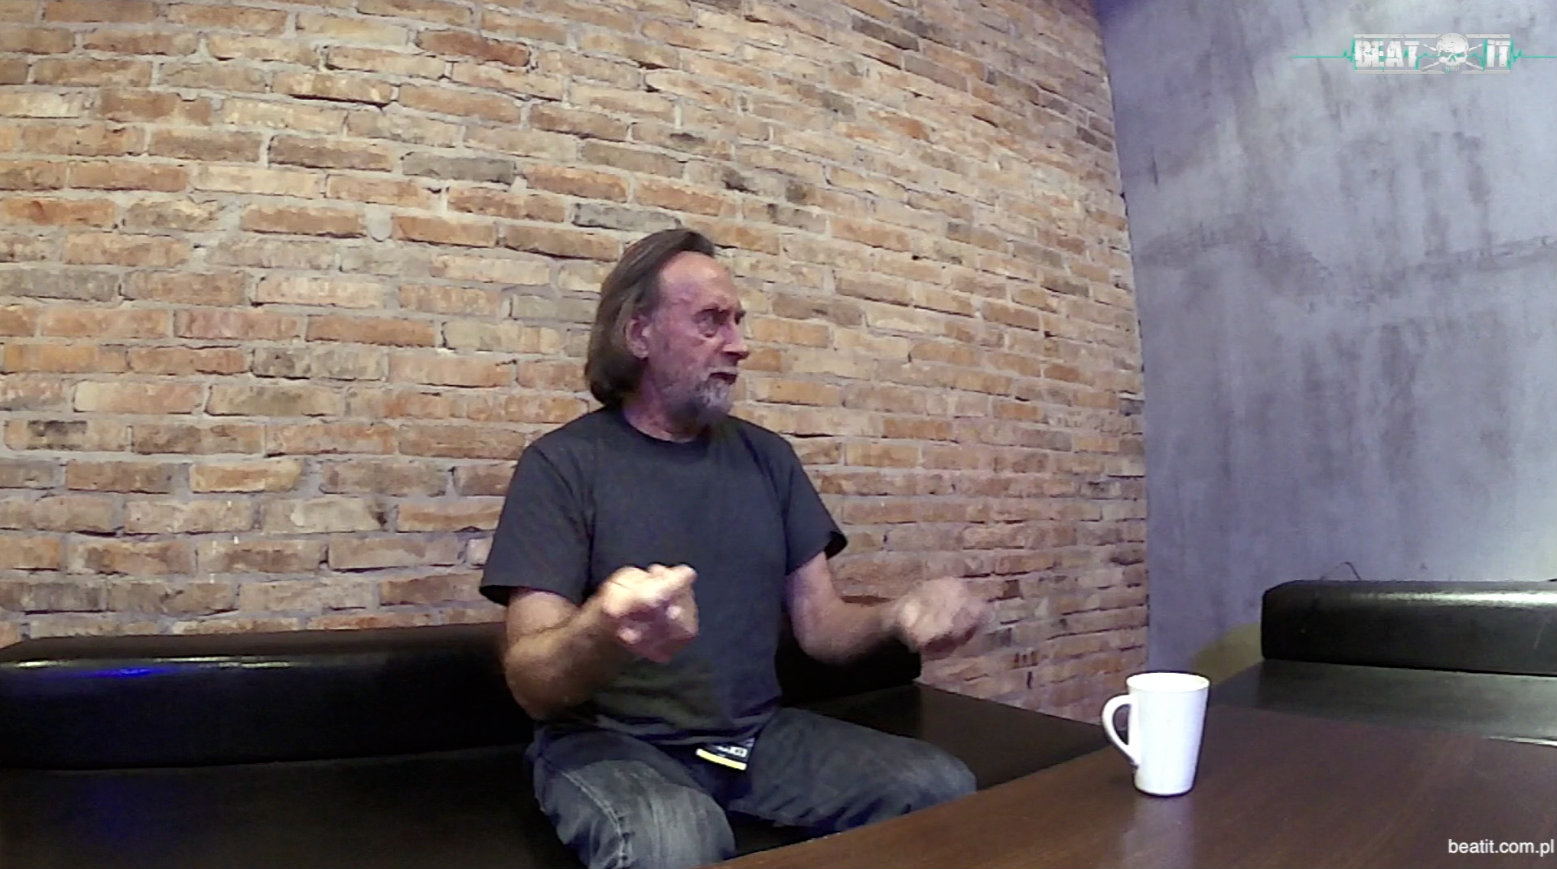 J. Piotrowski Interview, Pt. 1